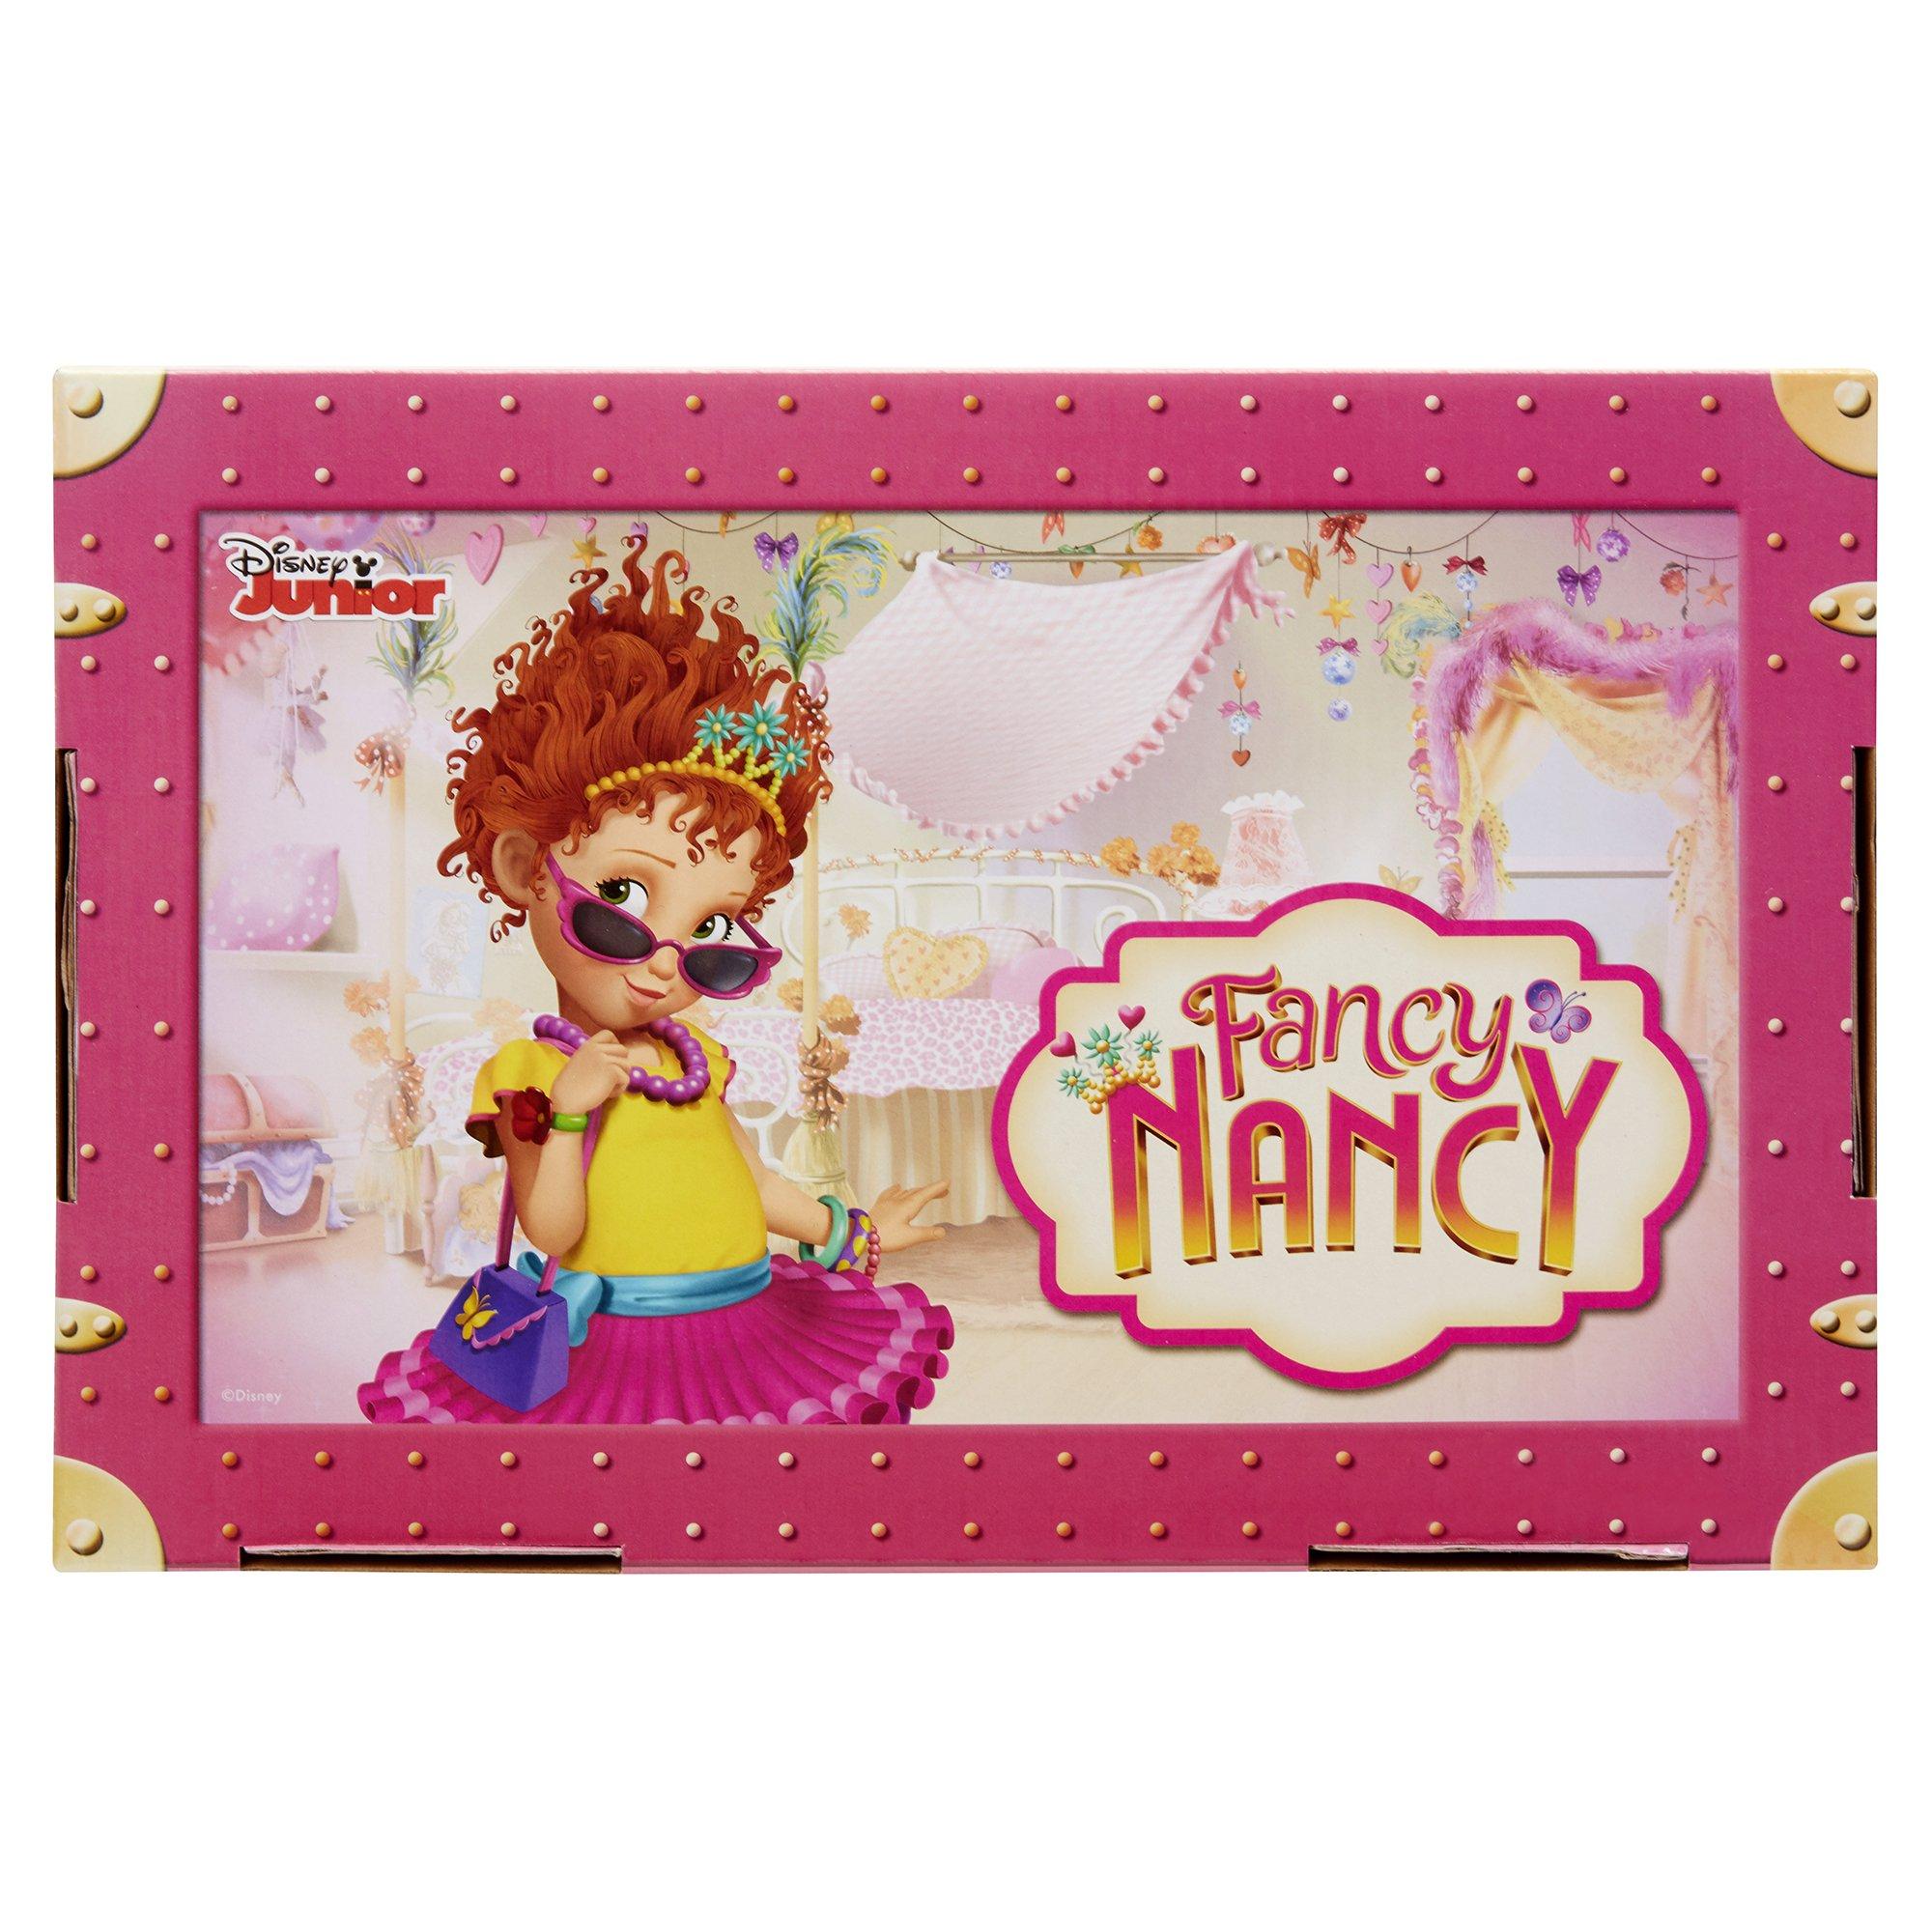 Fancy Nancy Ultimate Dress-Up Trunk, 13-Pieces, Fits Sizes 4-6X [Amazon Exclusive] by Fancy Nancy (Image #6)